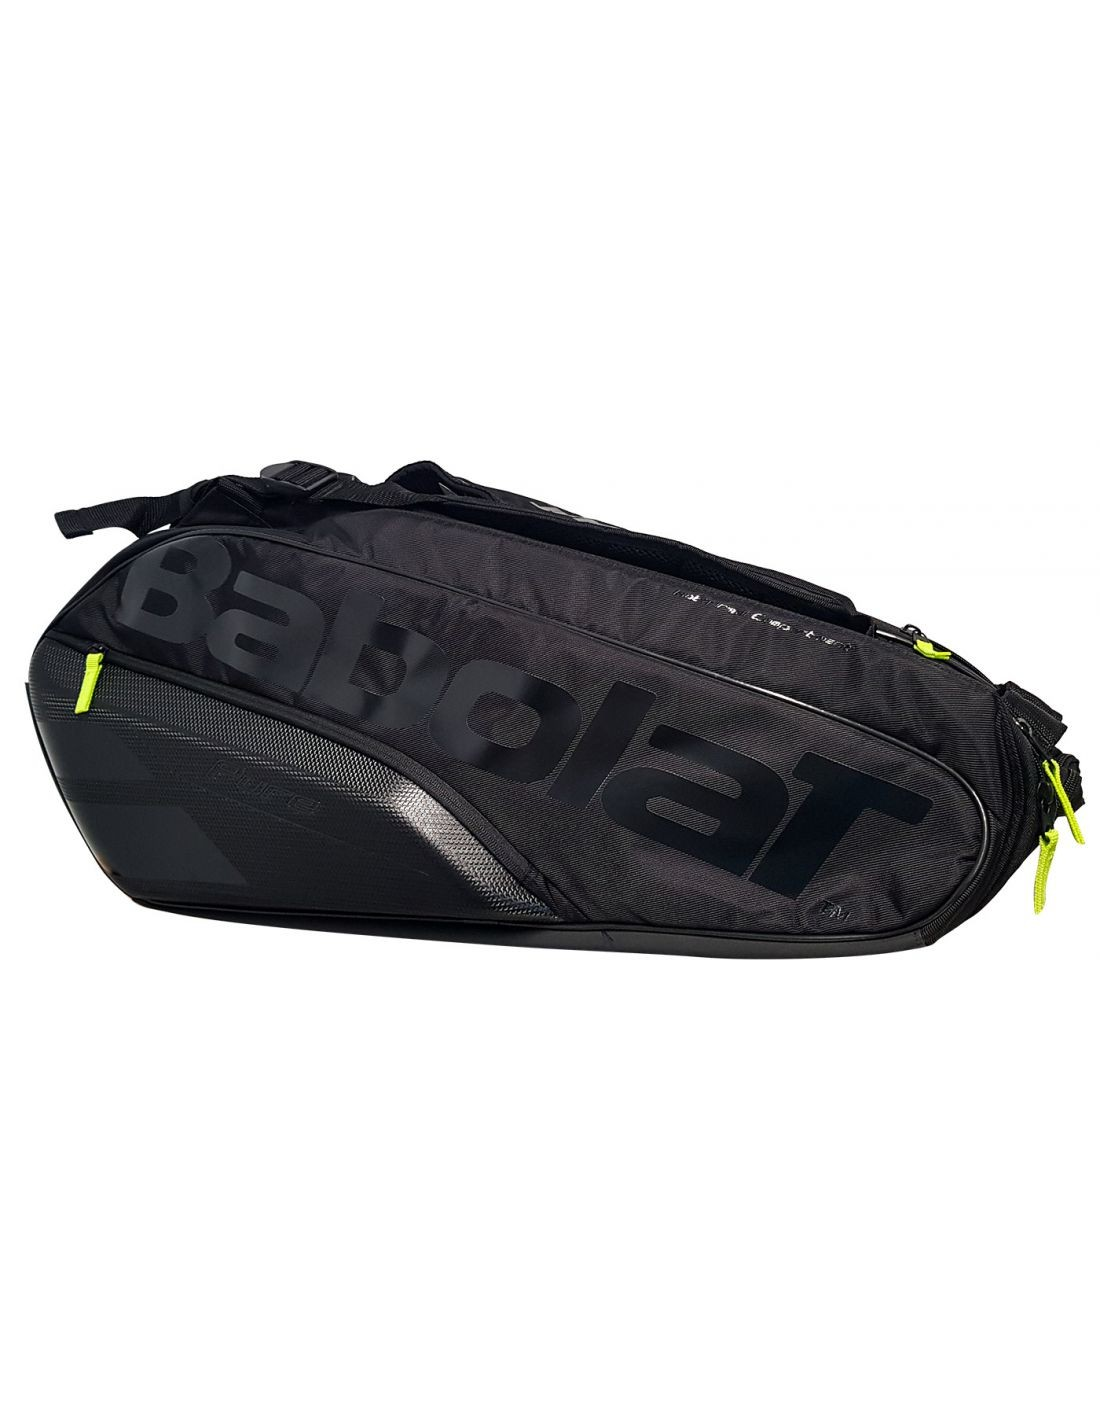 Torba tenisowa Babolat Pure Black 2020 Limited x6